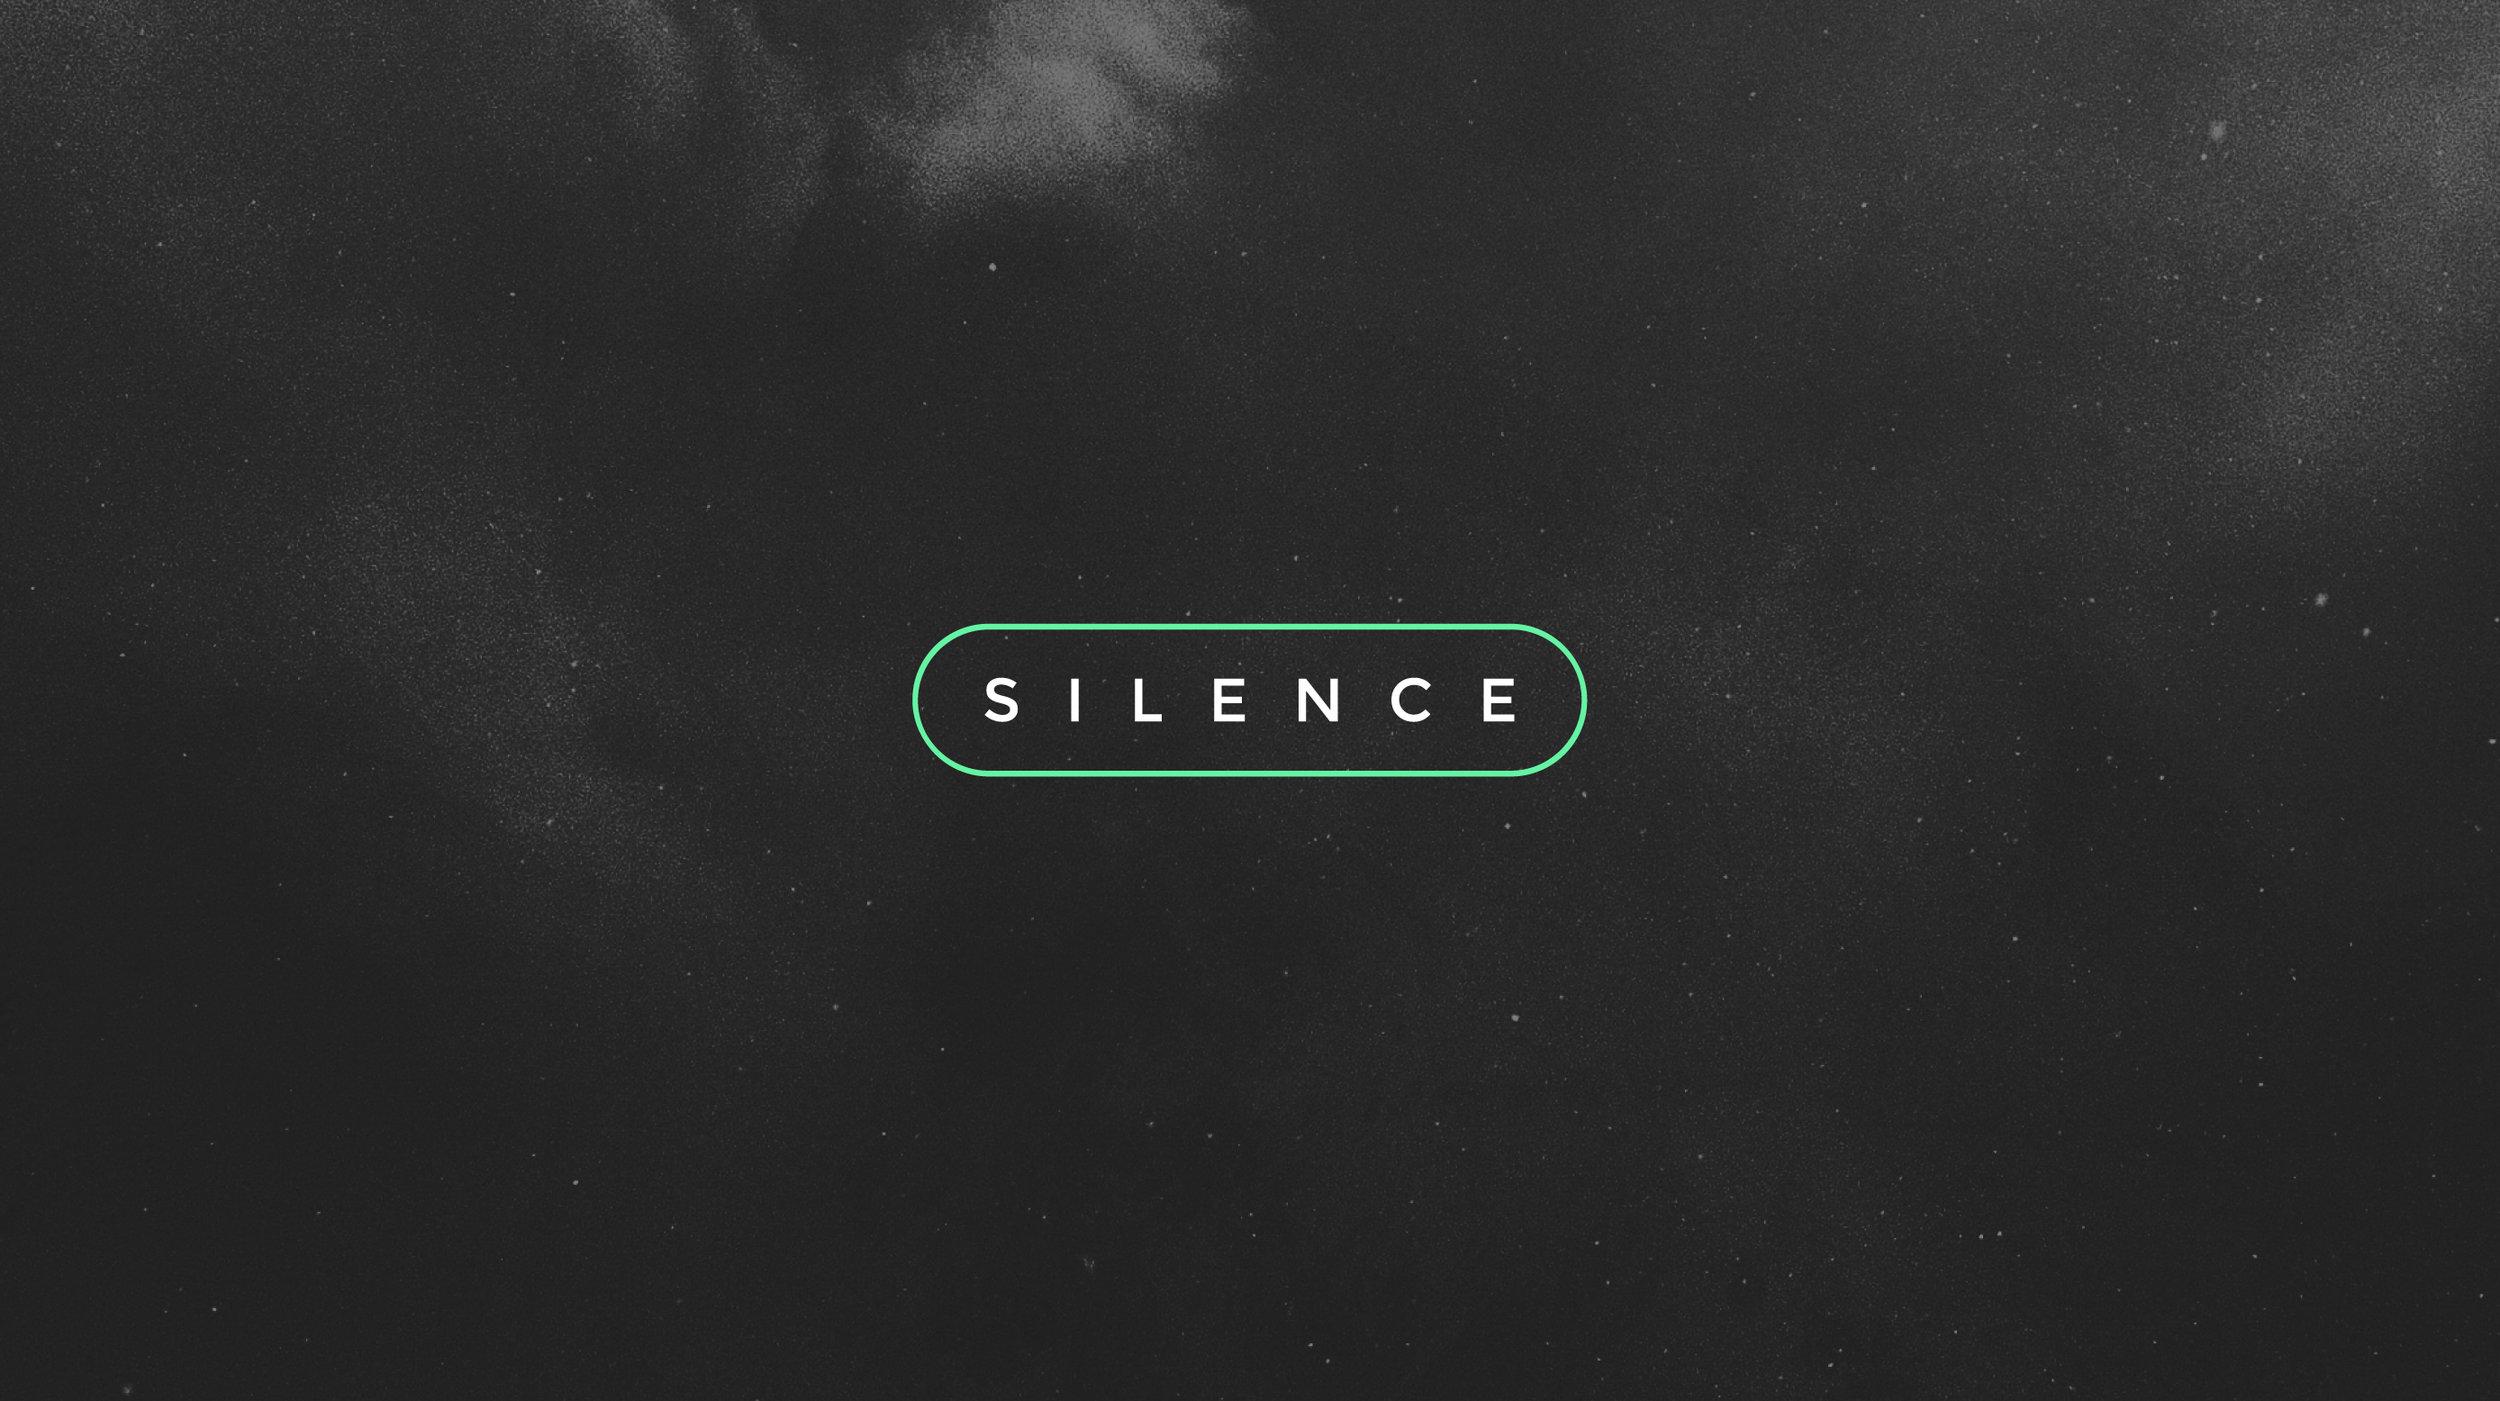 122435_SilenceGraphic_2776x1556_091217.jpg